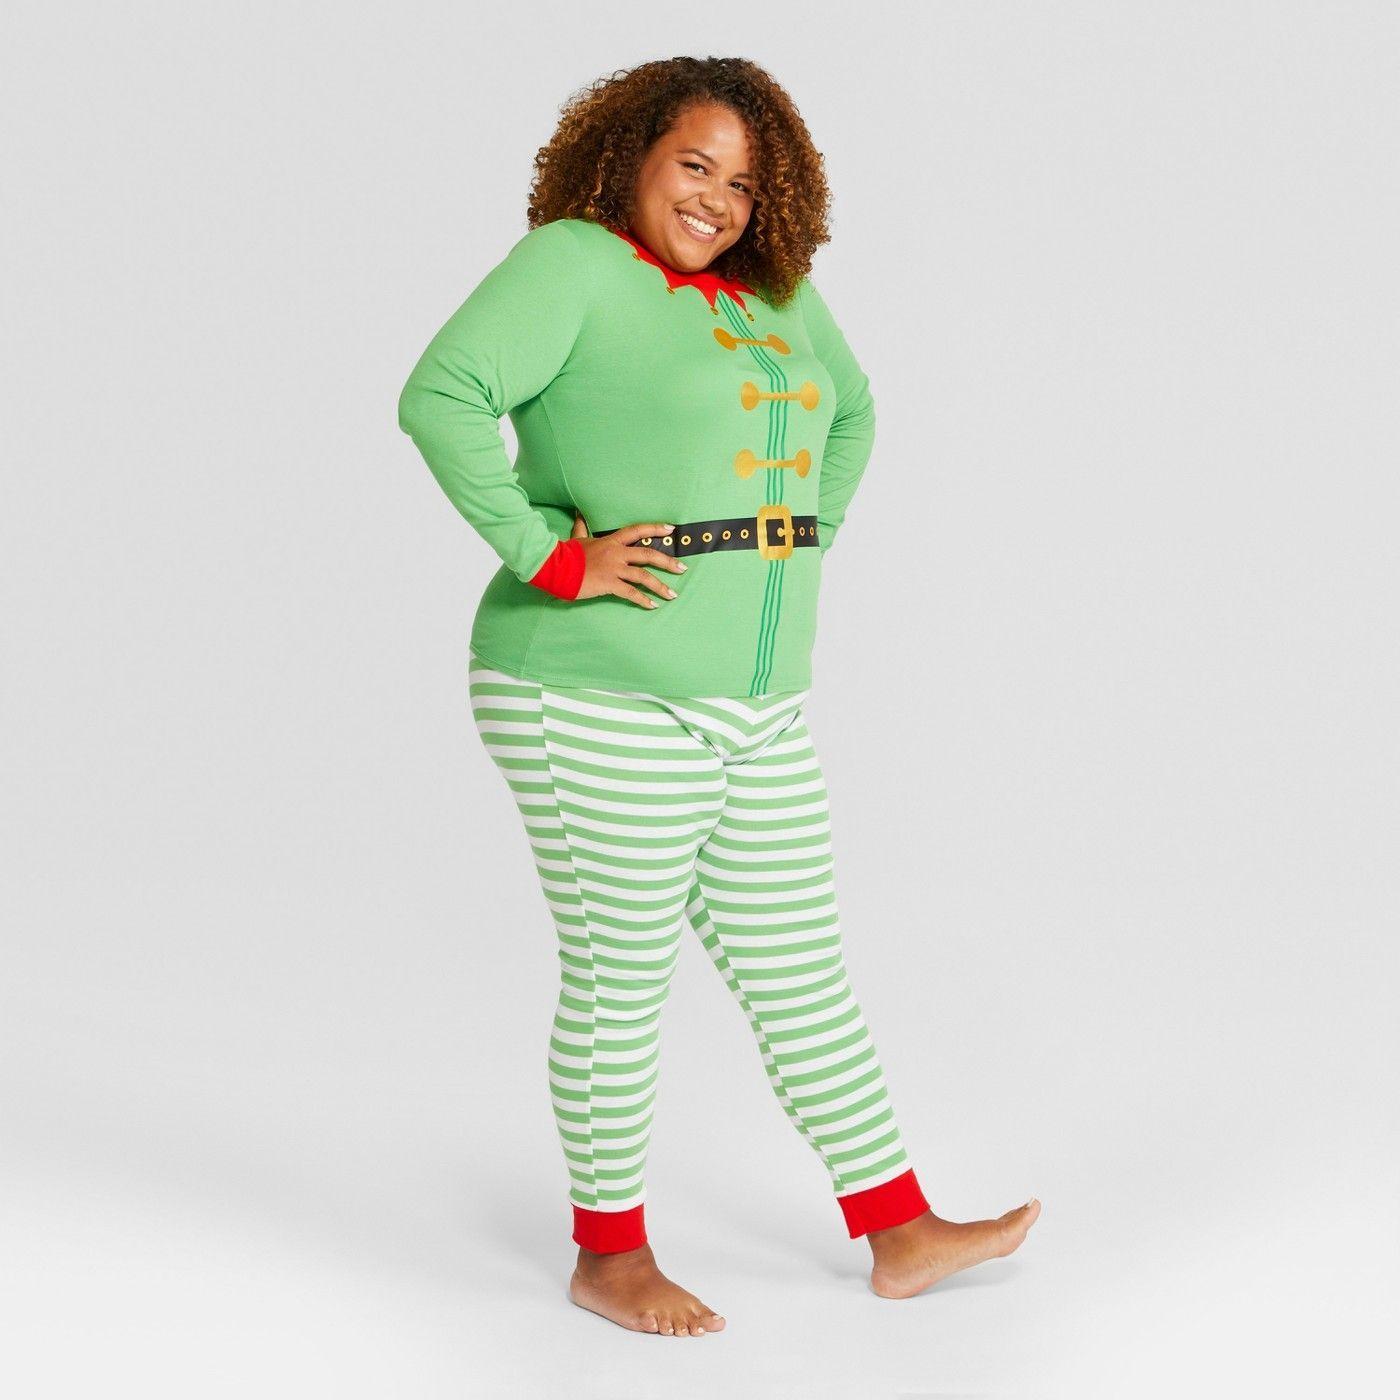 Women's Plus Size Holiday Elf Pajama Set at Target SALE